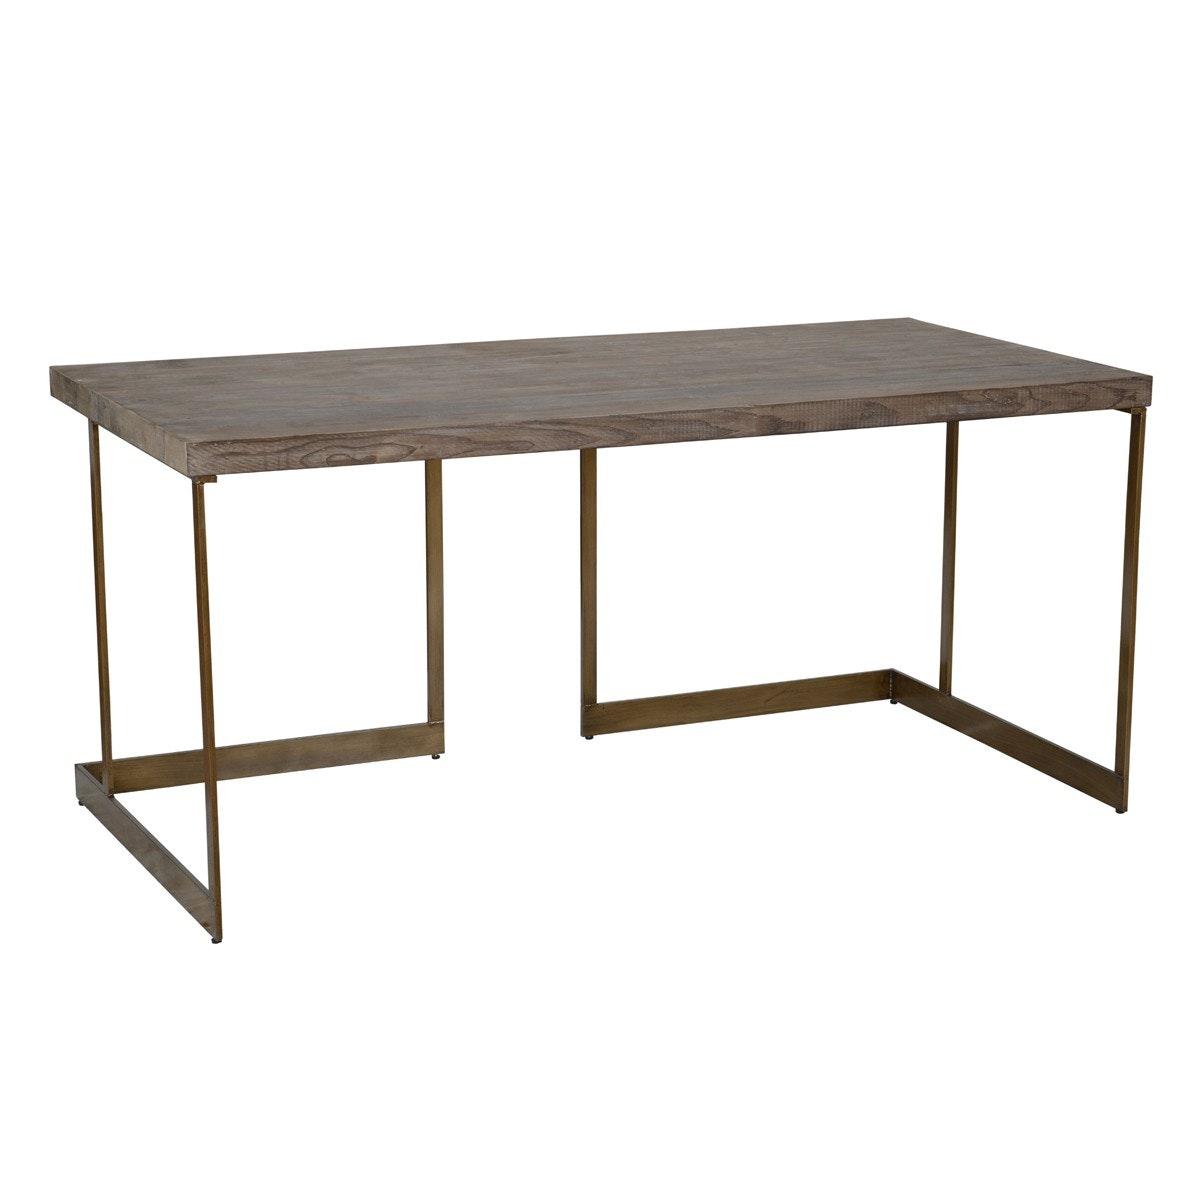 Noble Desk | The Find | Boutique Furniture In Reno, NV | Design Kollective